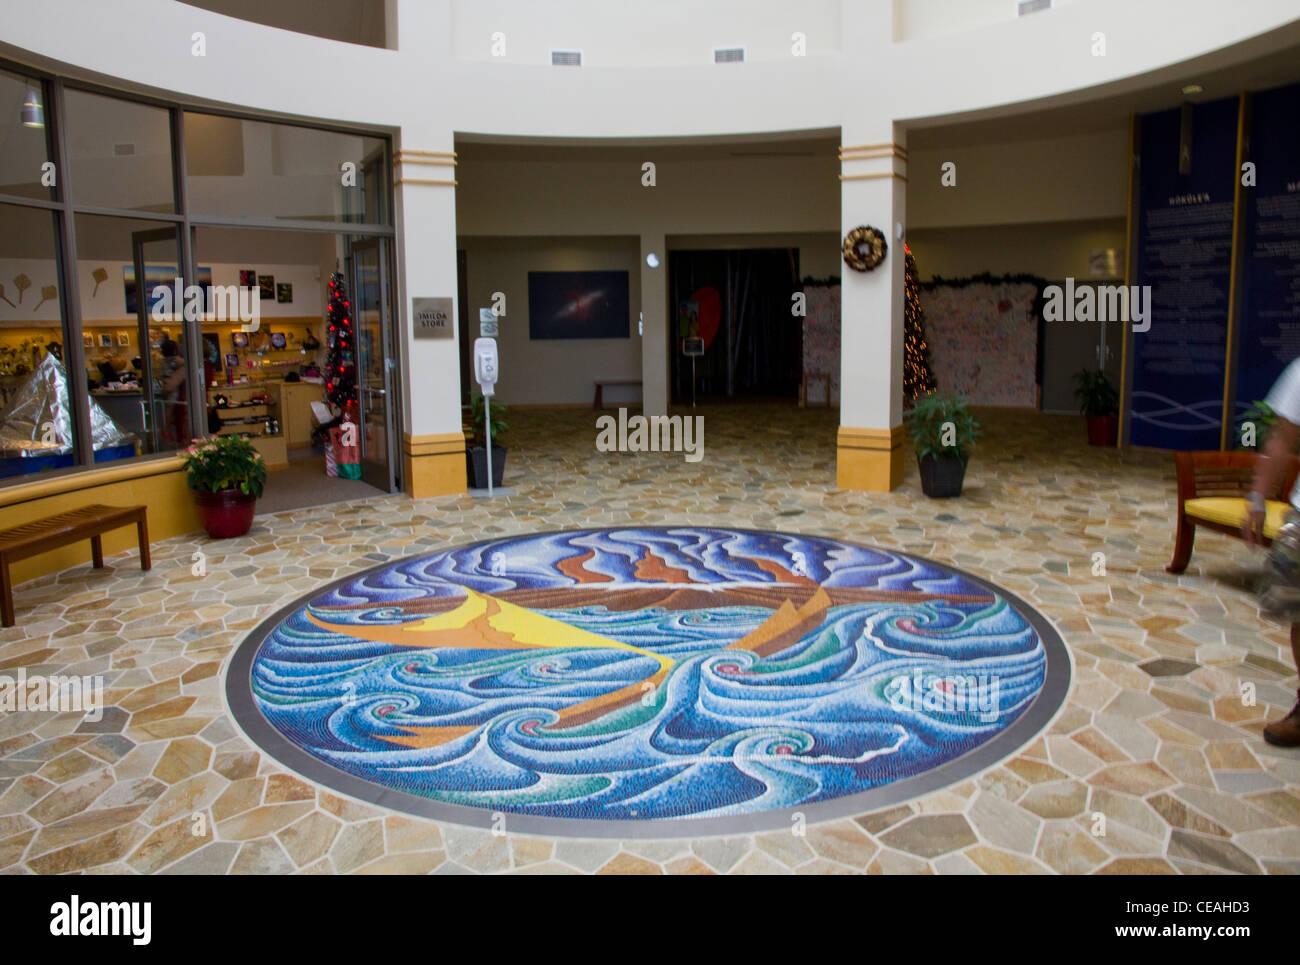 Floor art, Imiloa Astronomy Center, Hilo, Big island, Hawaii - Stock Image